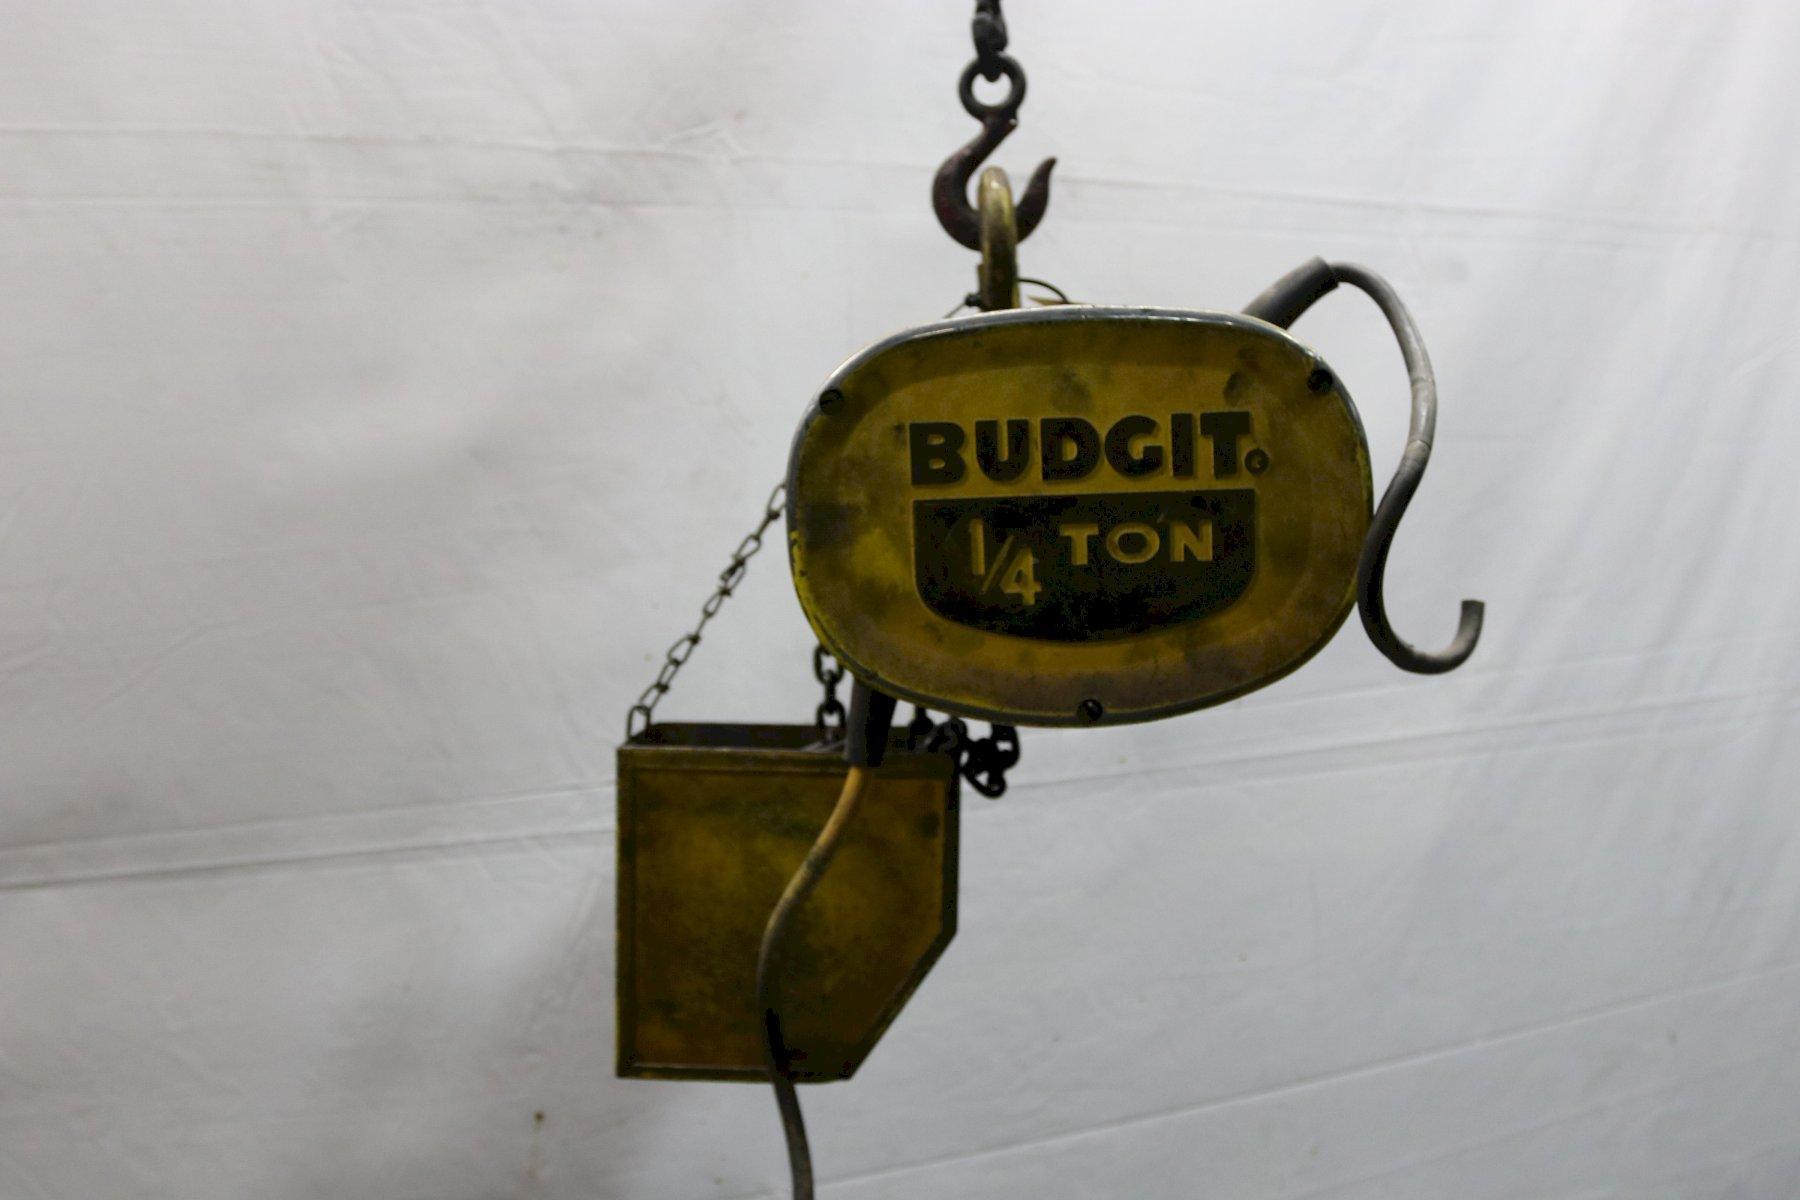 1/4 TON BUDGIT ELECTRIC POWERED CHAIN HOIST: STOCK #11988